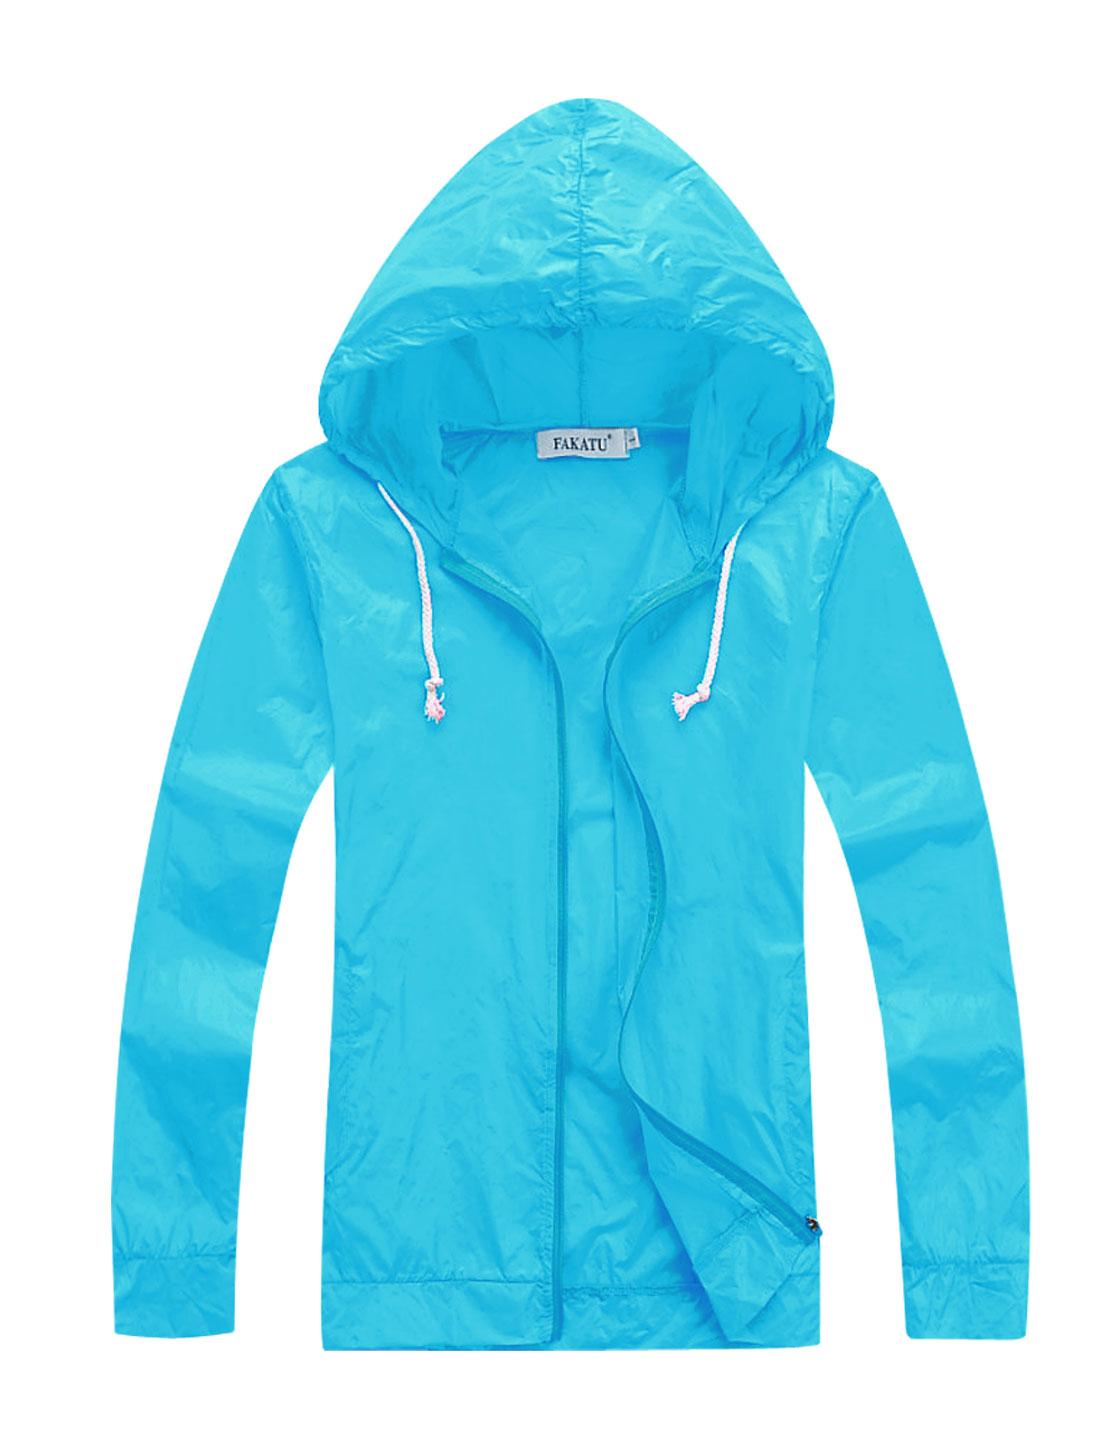 Men's Semi Sheer Front Pockets Zip Up Hoodie Jacket Blue M